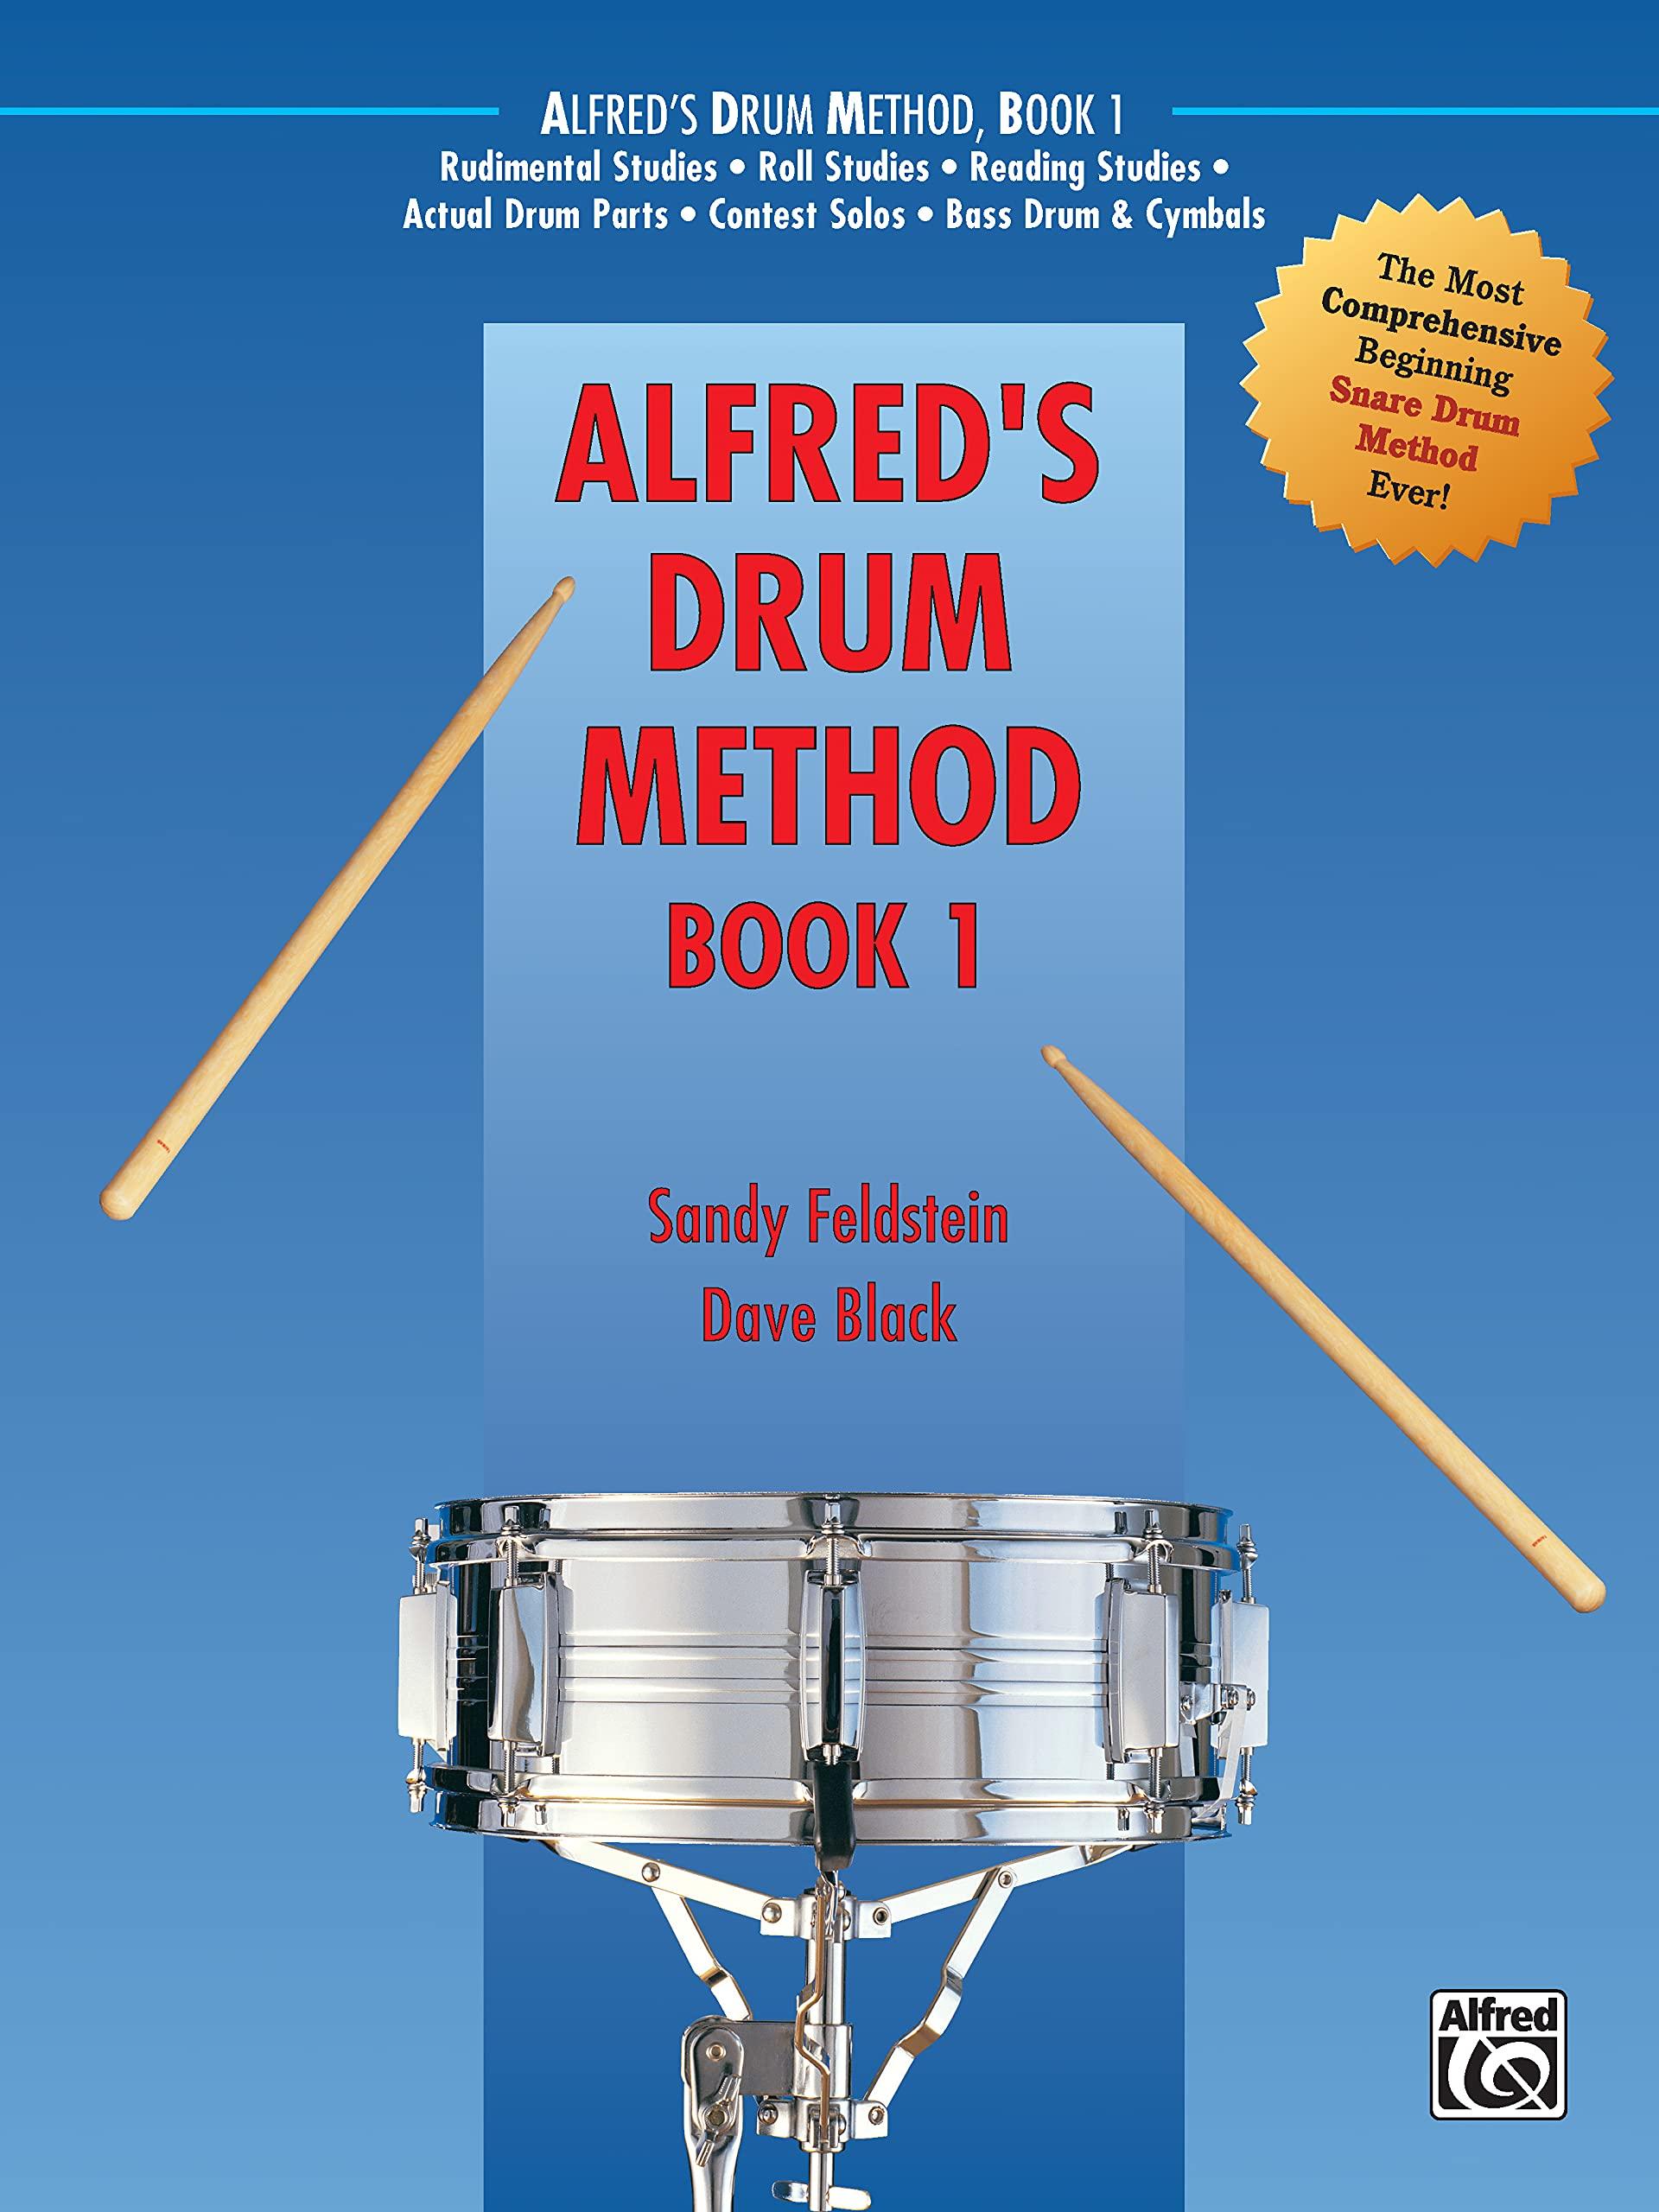 Alfred's Drum Method, Bk 1: The Most Comprehensive Beginning Snare Drum Method Ever!: Sandy Feldstein, Dave Black: 9780882847931: Amazon.com: Books